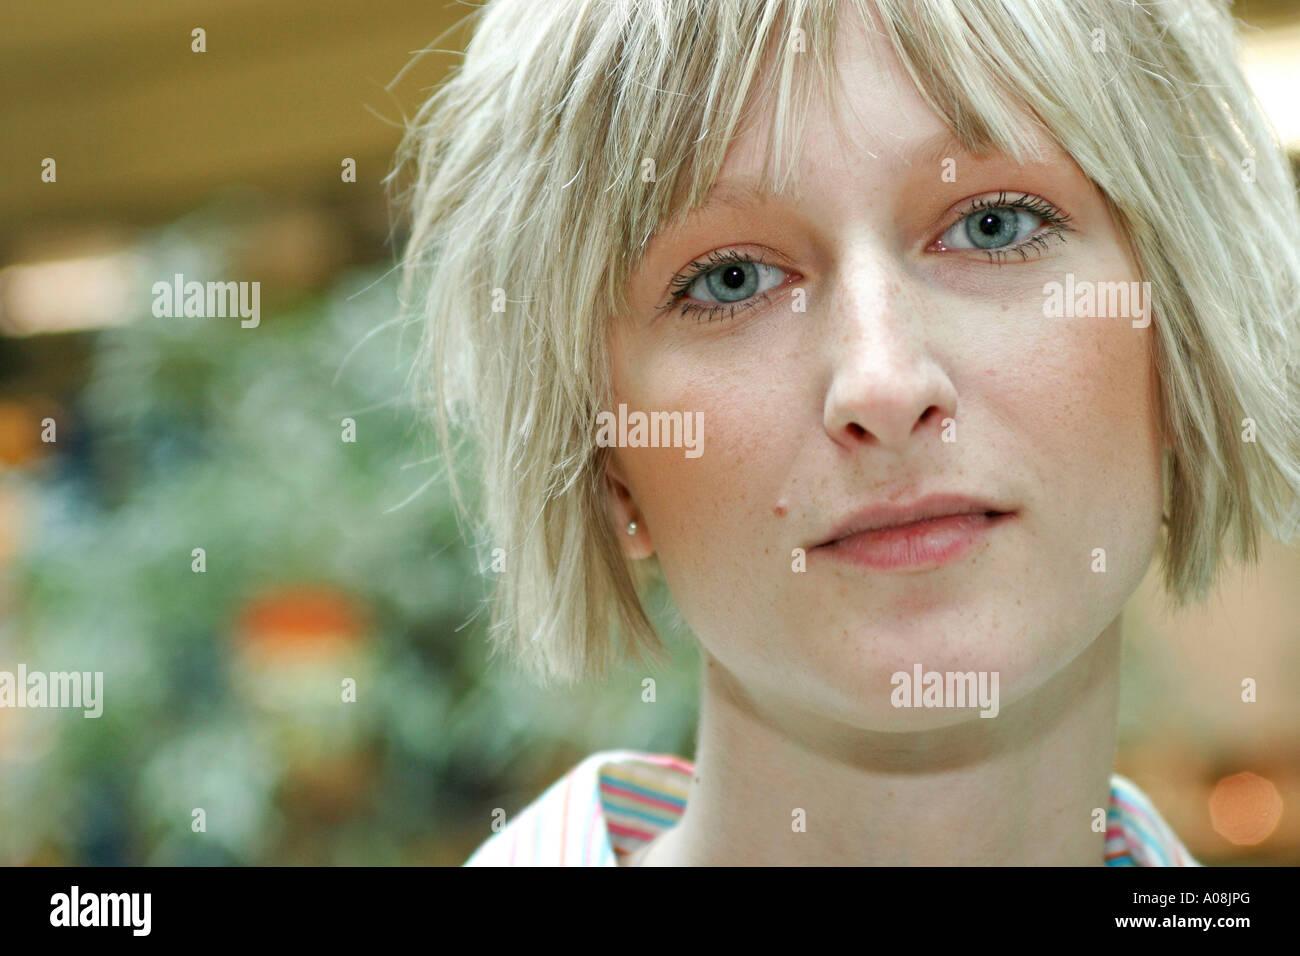 Junge blonde Frau, young blonde woman portrait - Stock Image